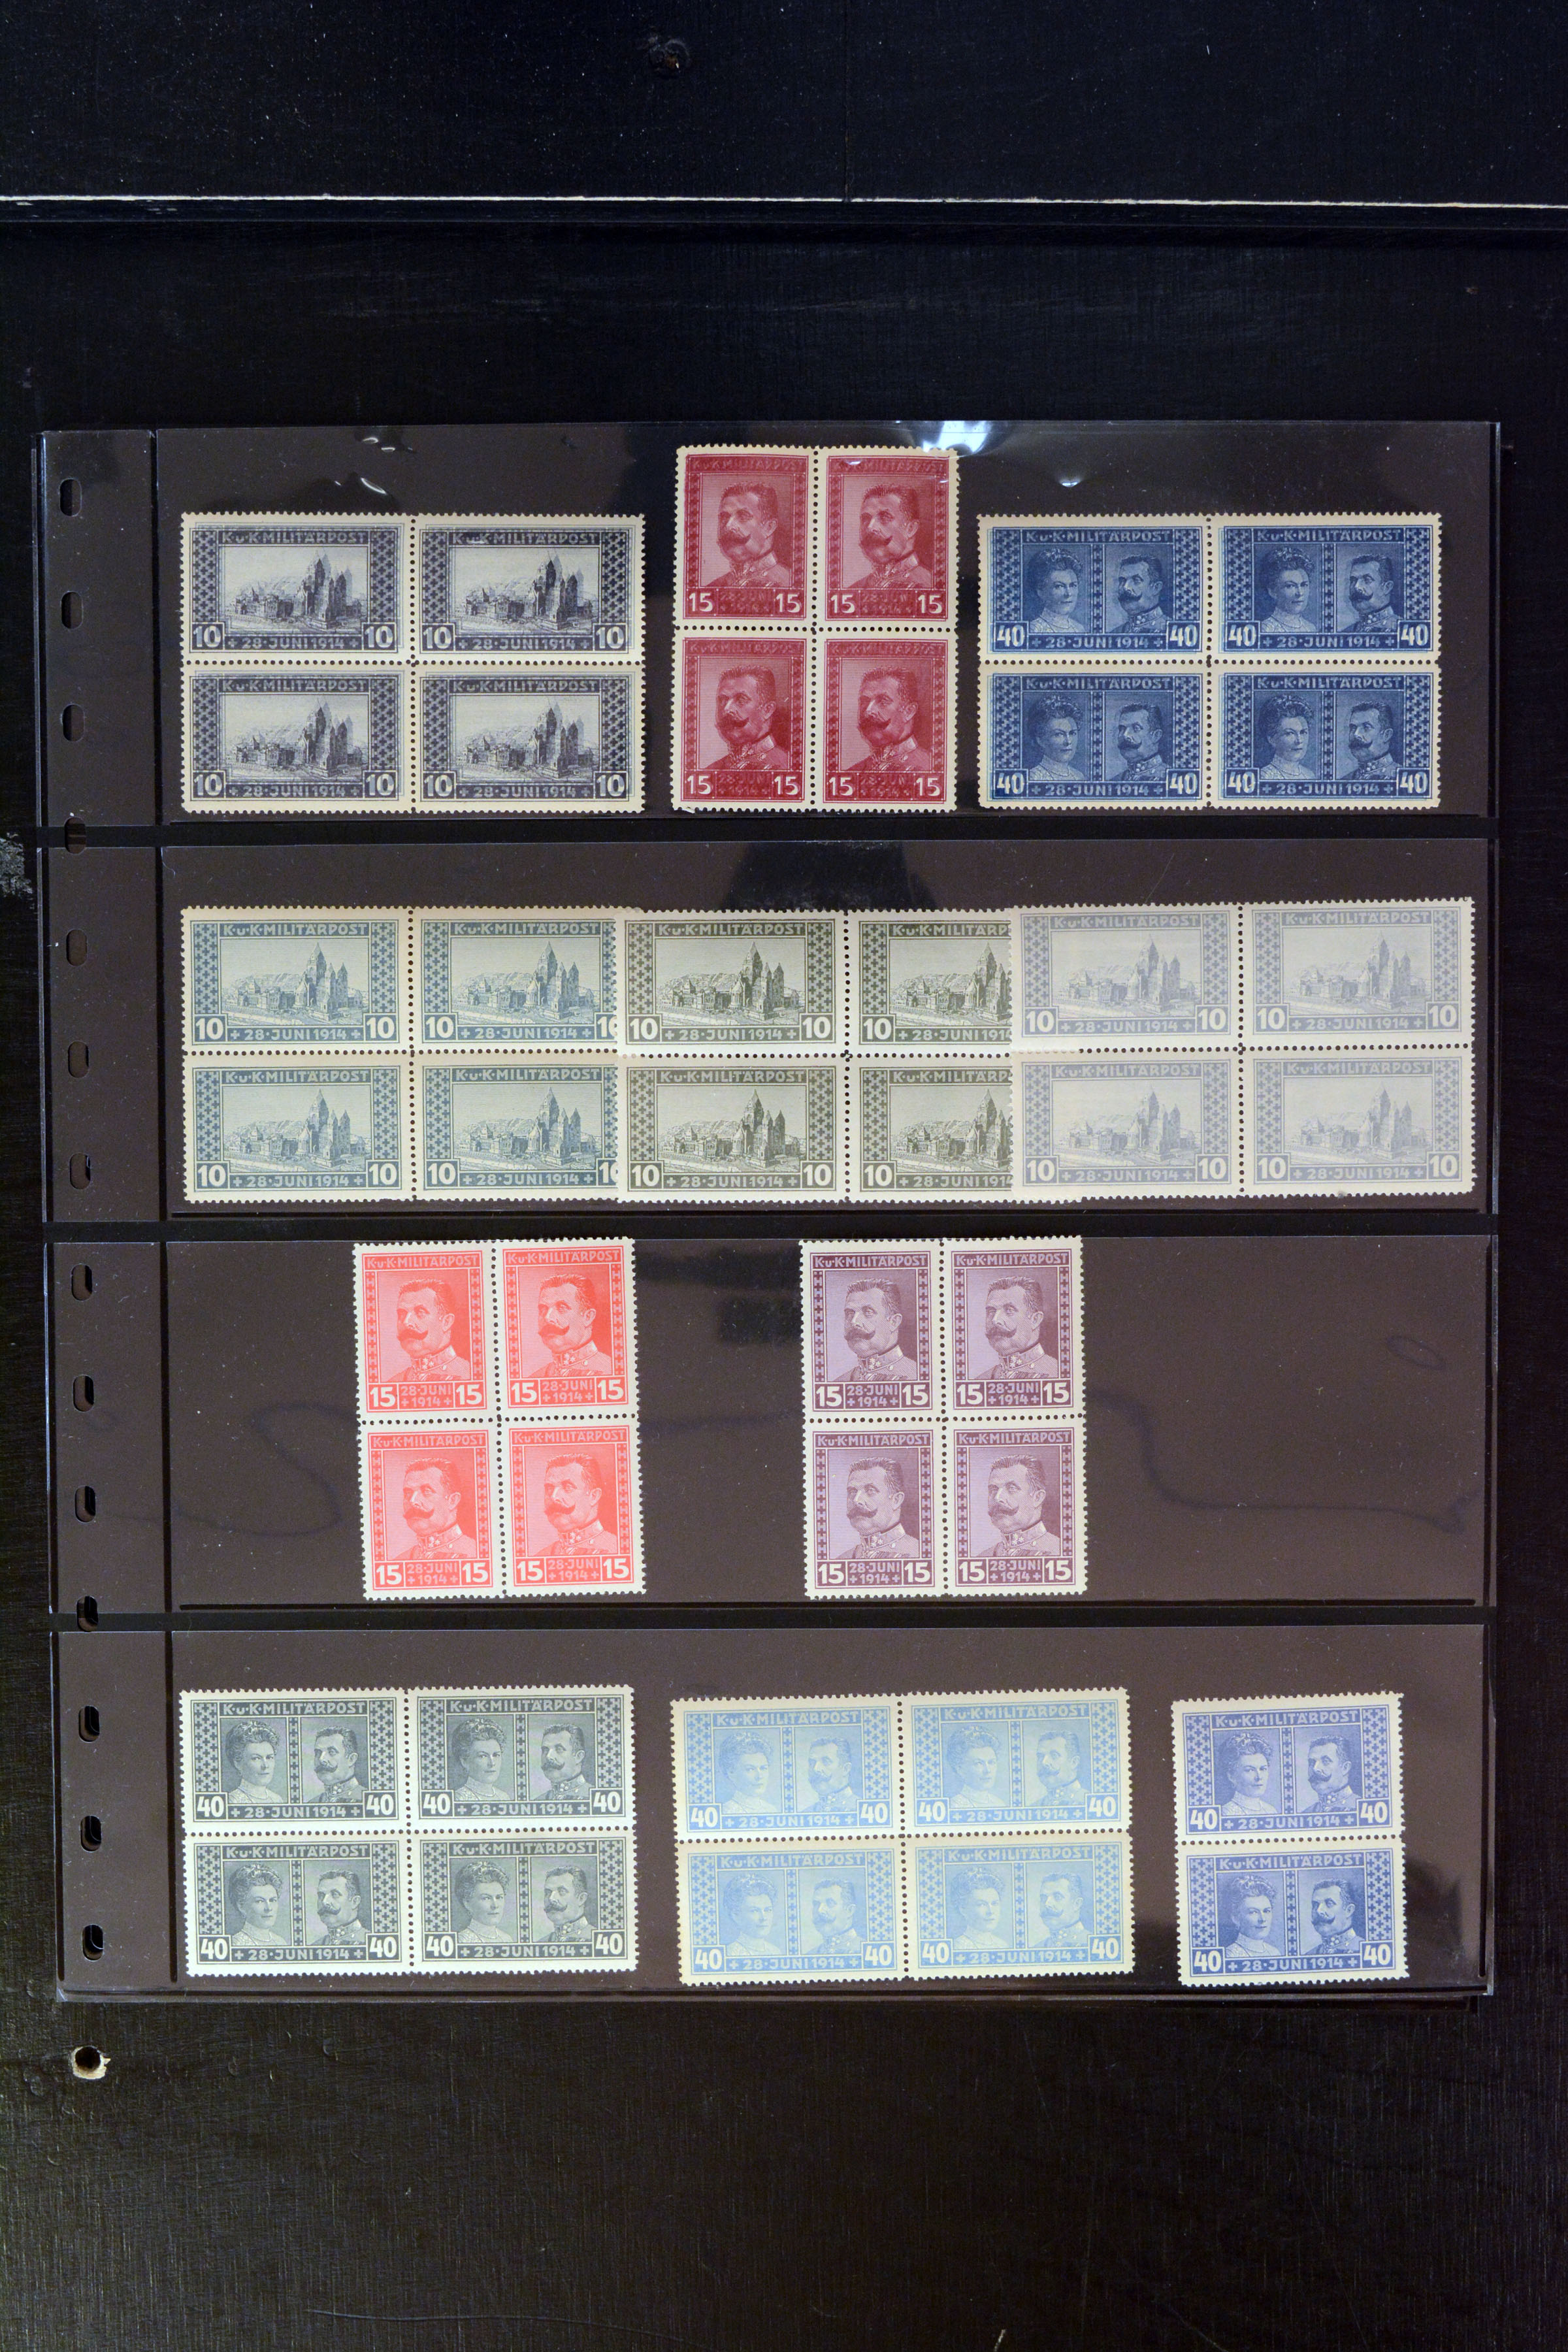 Lot 4060 - europe bosnia and herzegovina -  Heinrich Koehler Auktionen Auction #368- Day 3